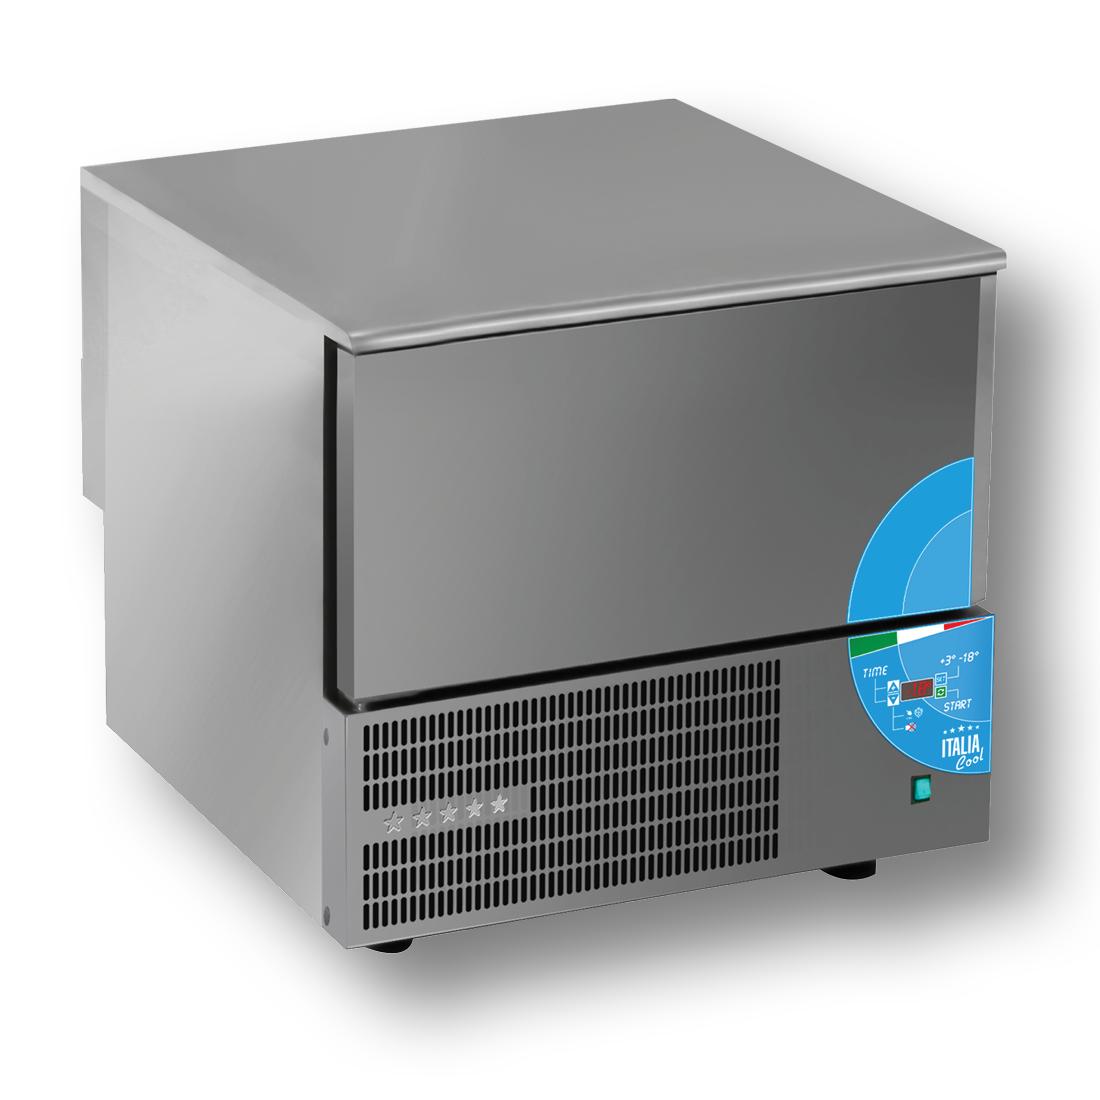 DO3 Blast Chiller & Shock Freezer